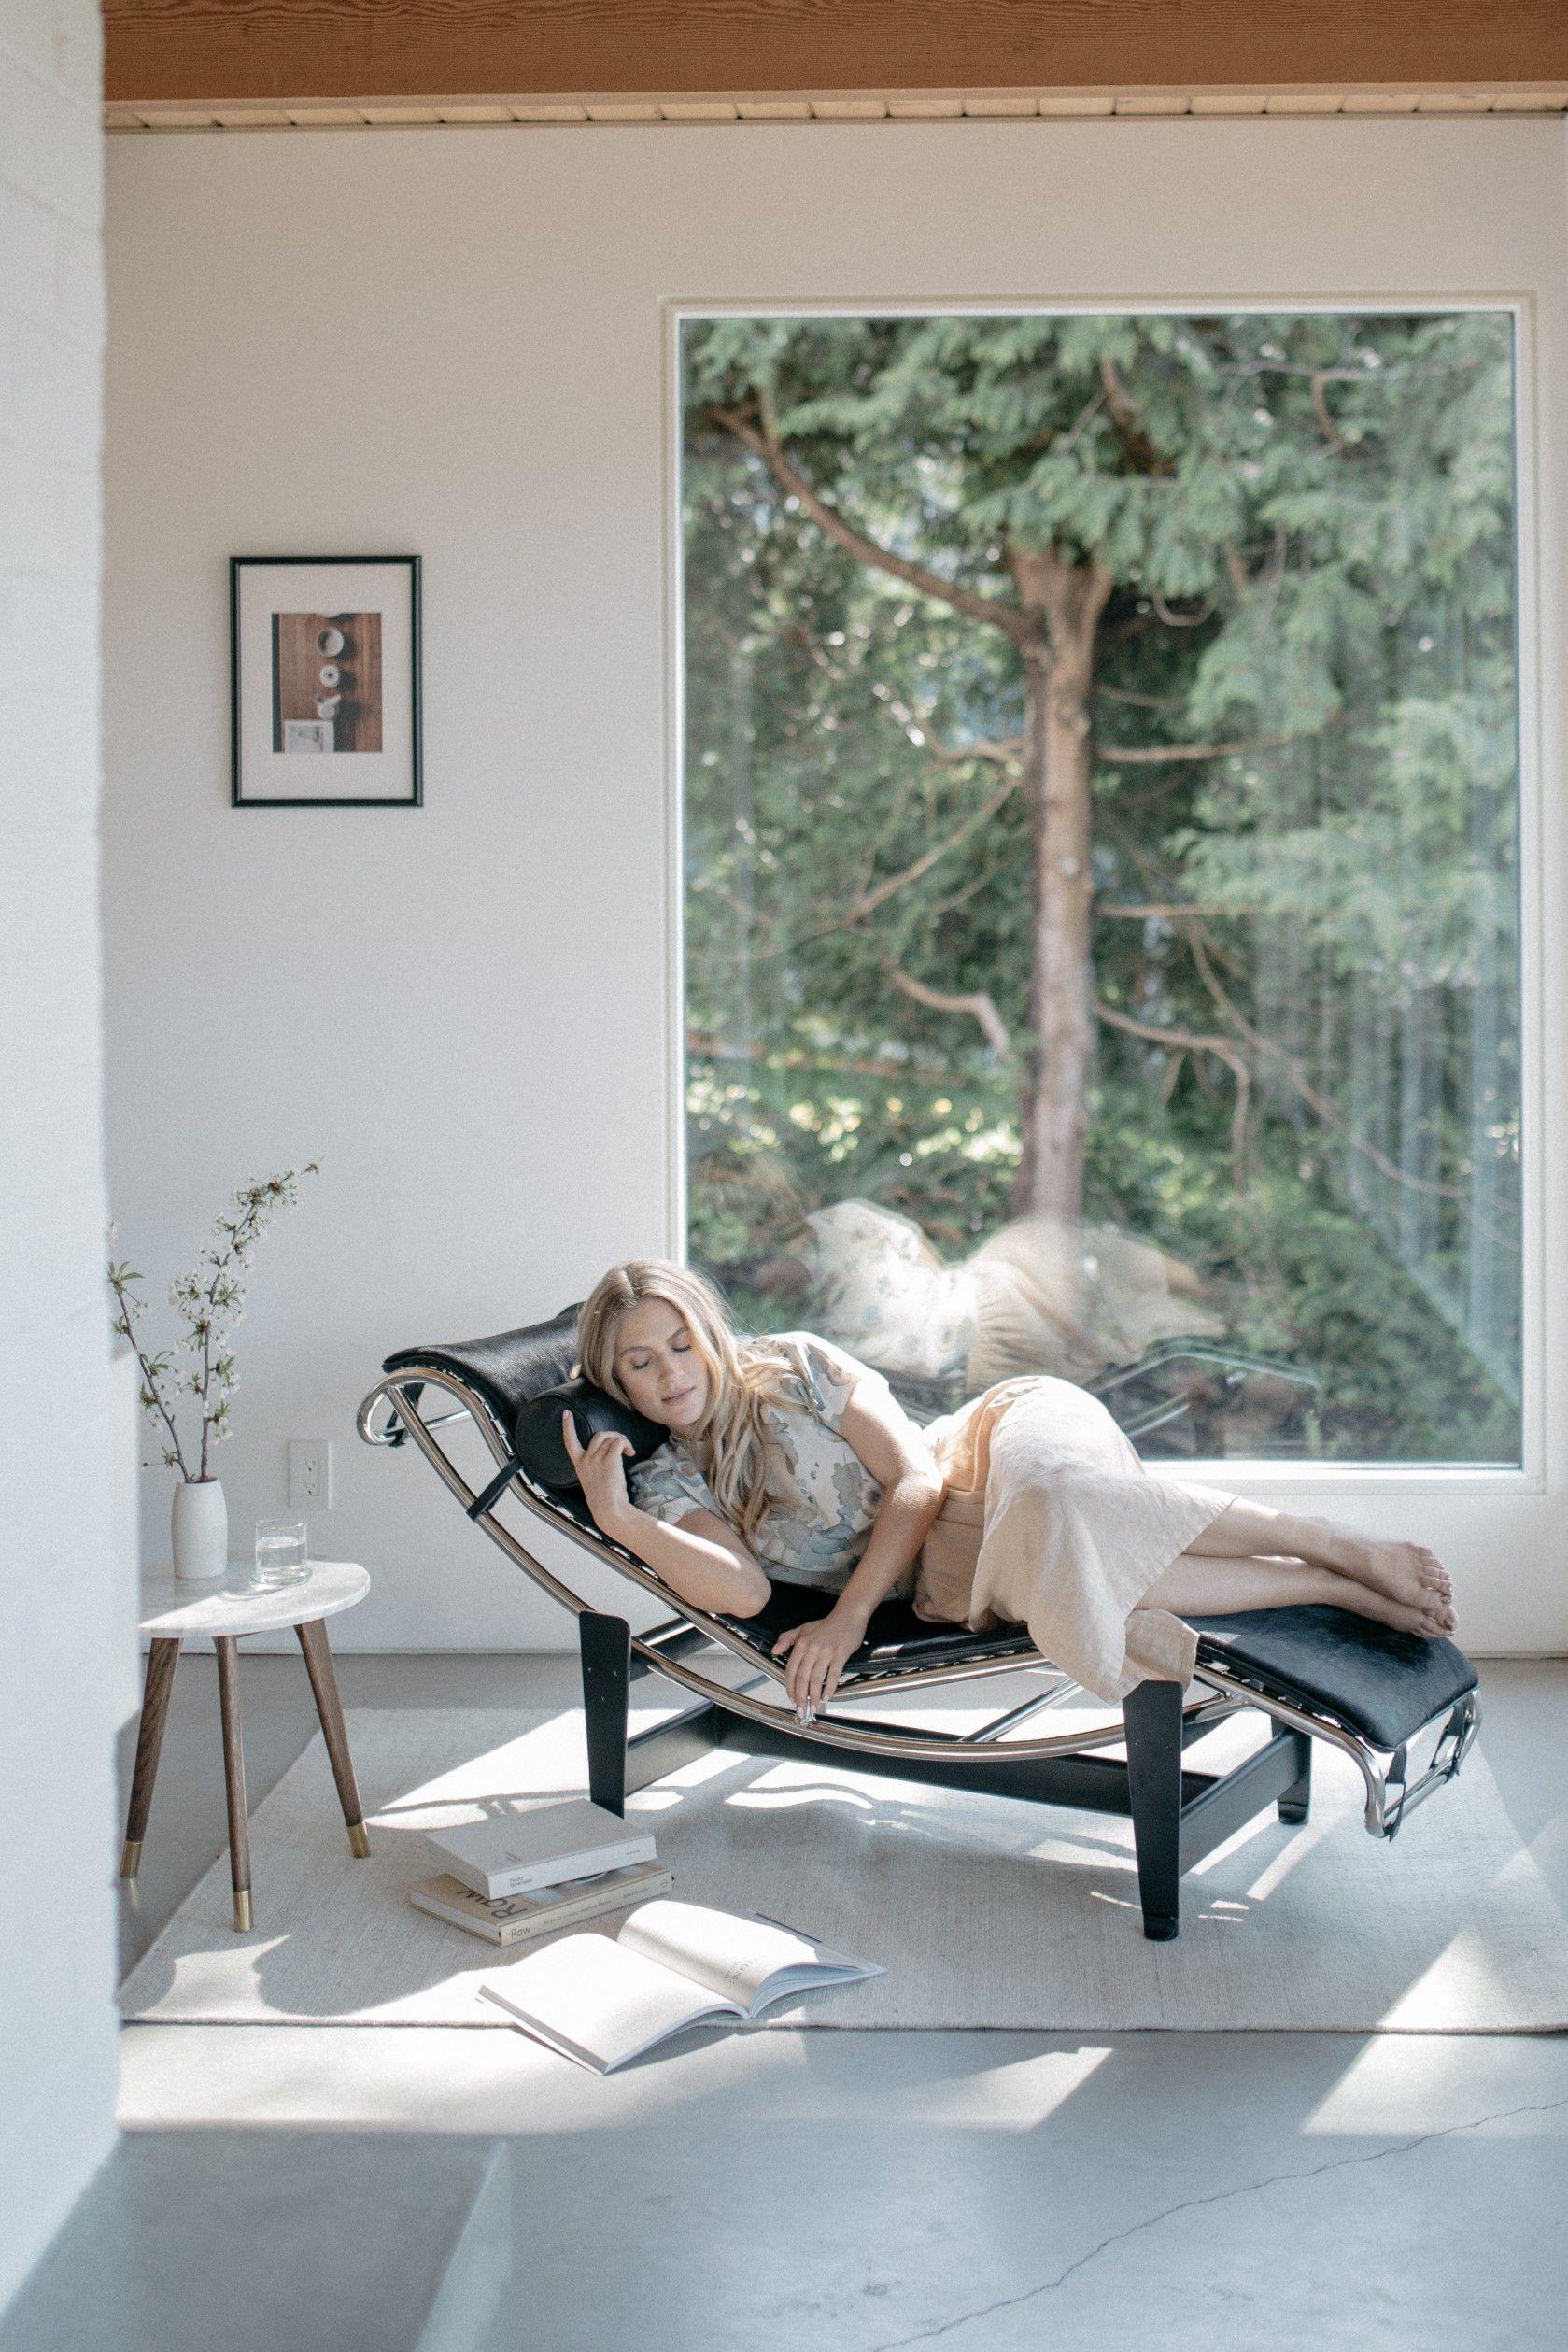 Le Corbusier Lc4 Chaise Longue In 2020 Corbusier Furniture Lc4 Chaise Lounge Corbusier Chair